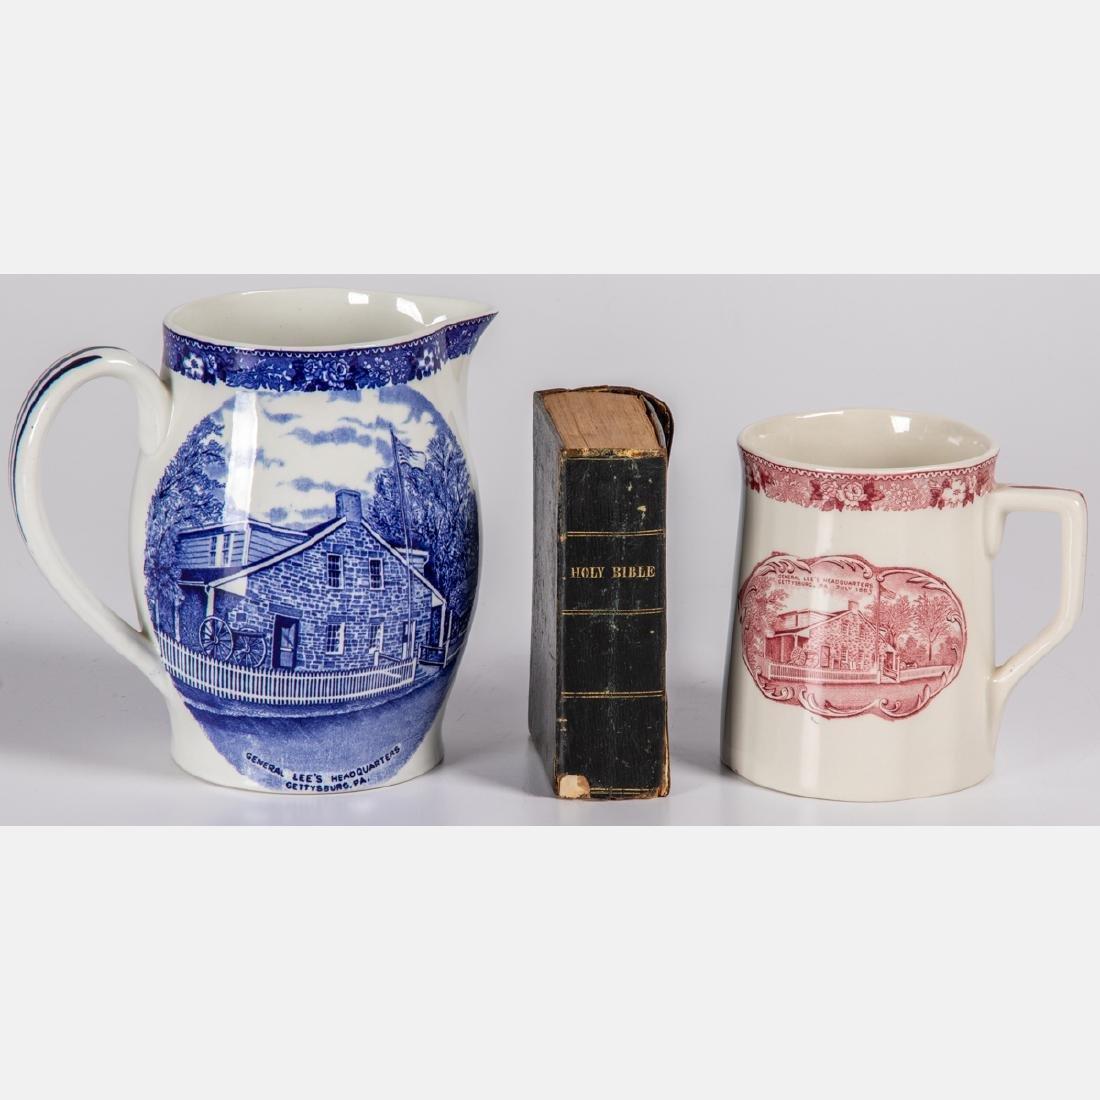 Two Staffordshire Pottery Civil War Themed Mug and